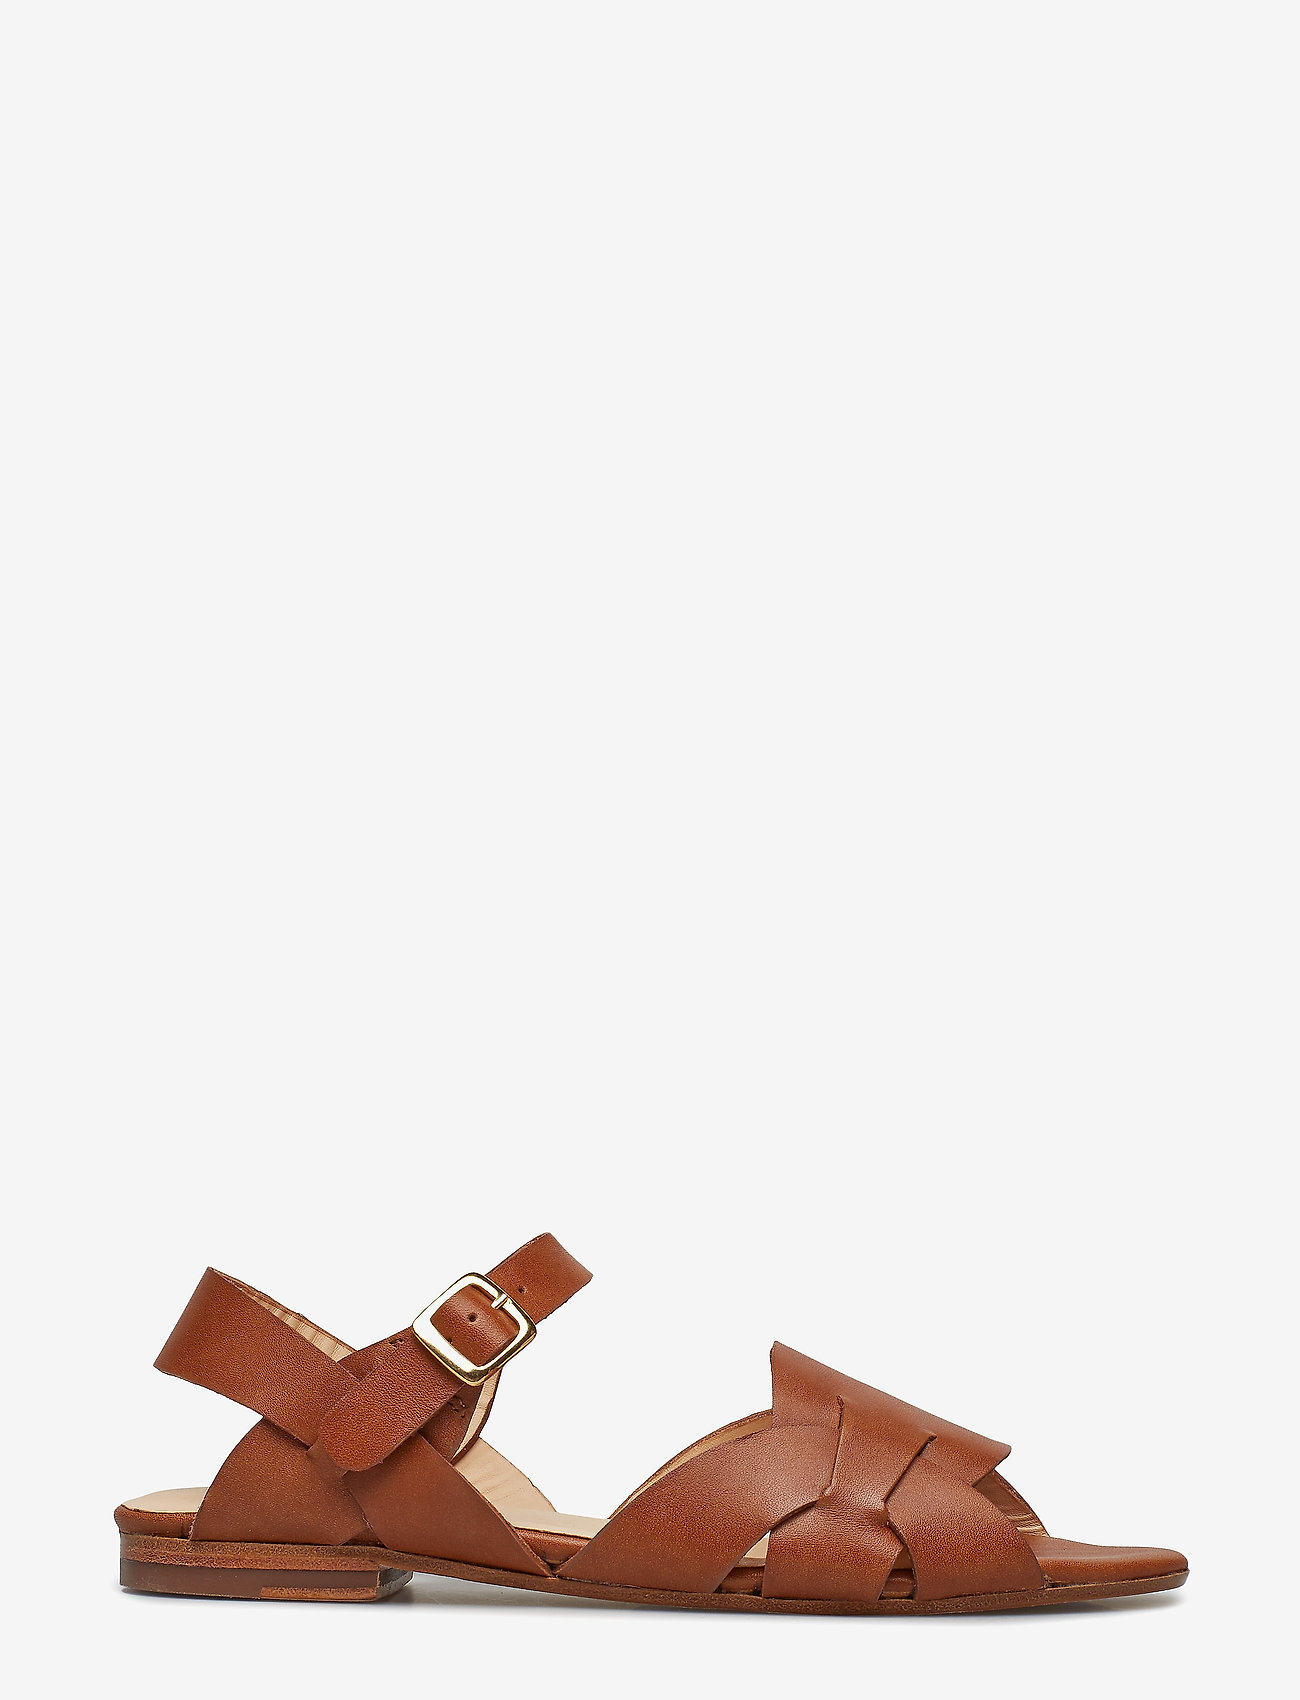 ANGULUS - Sandals - flat - flade sandaler - 1789 tan - 1